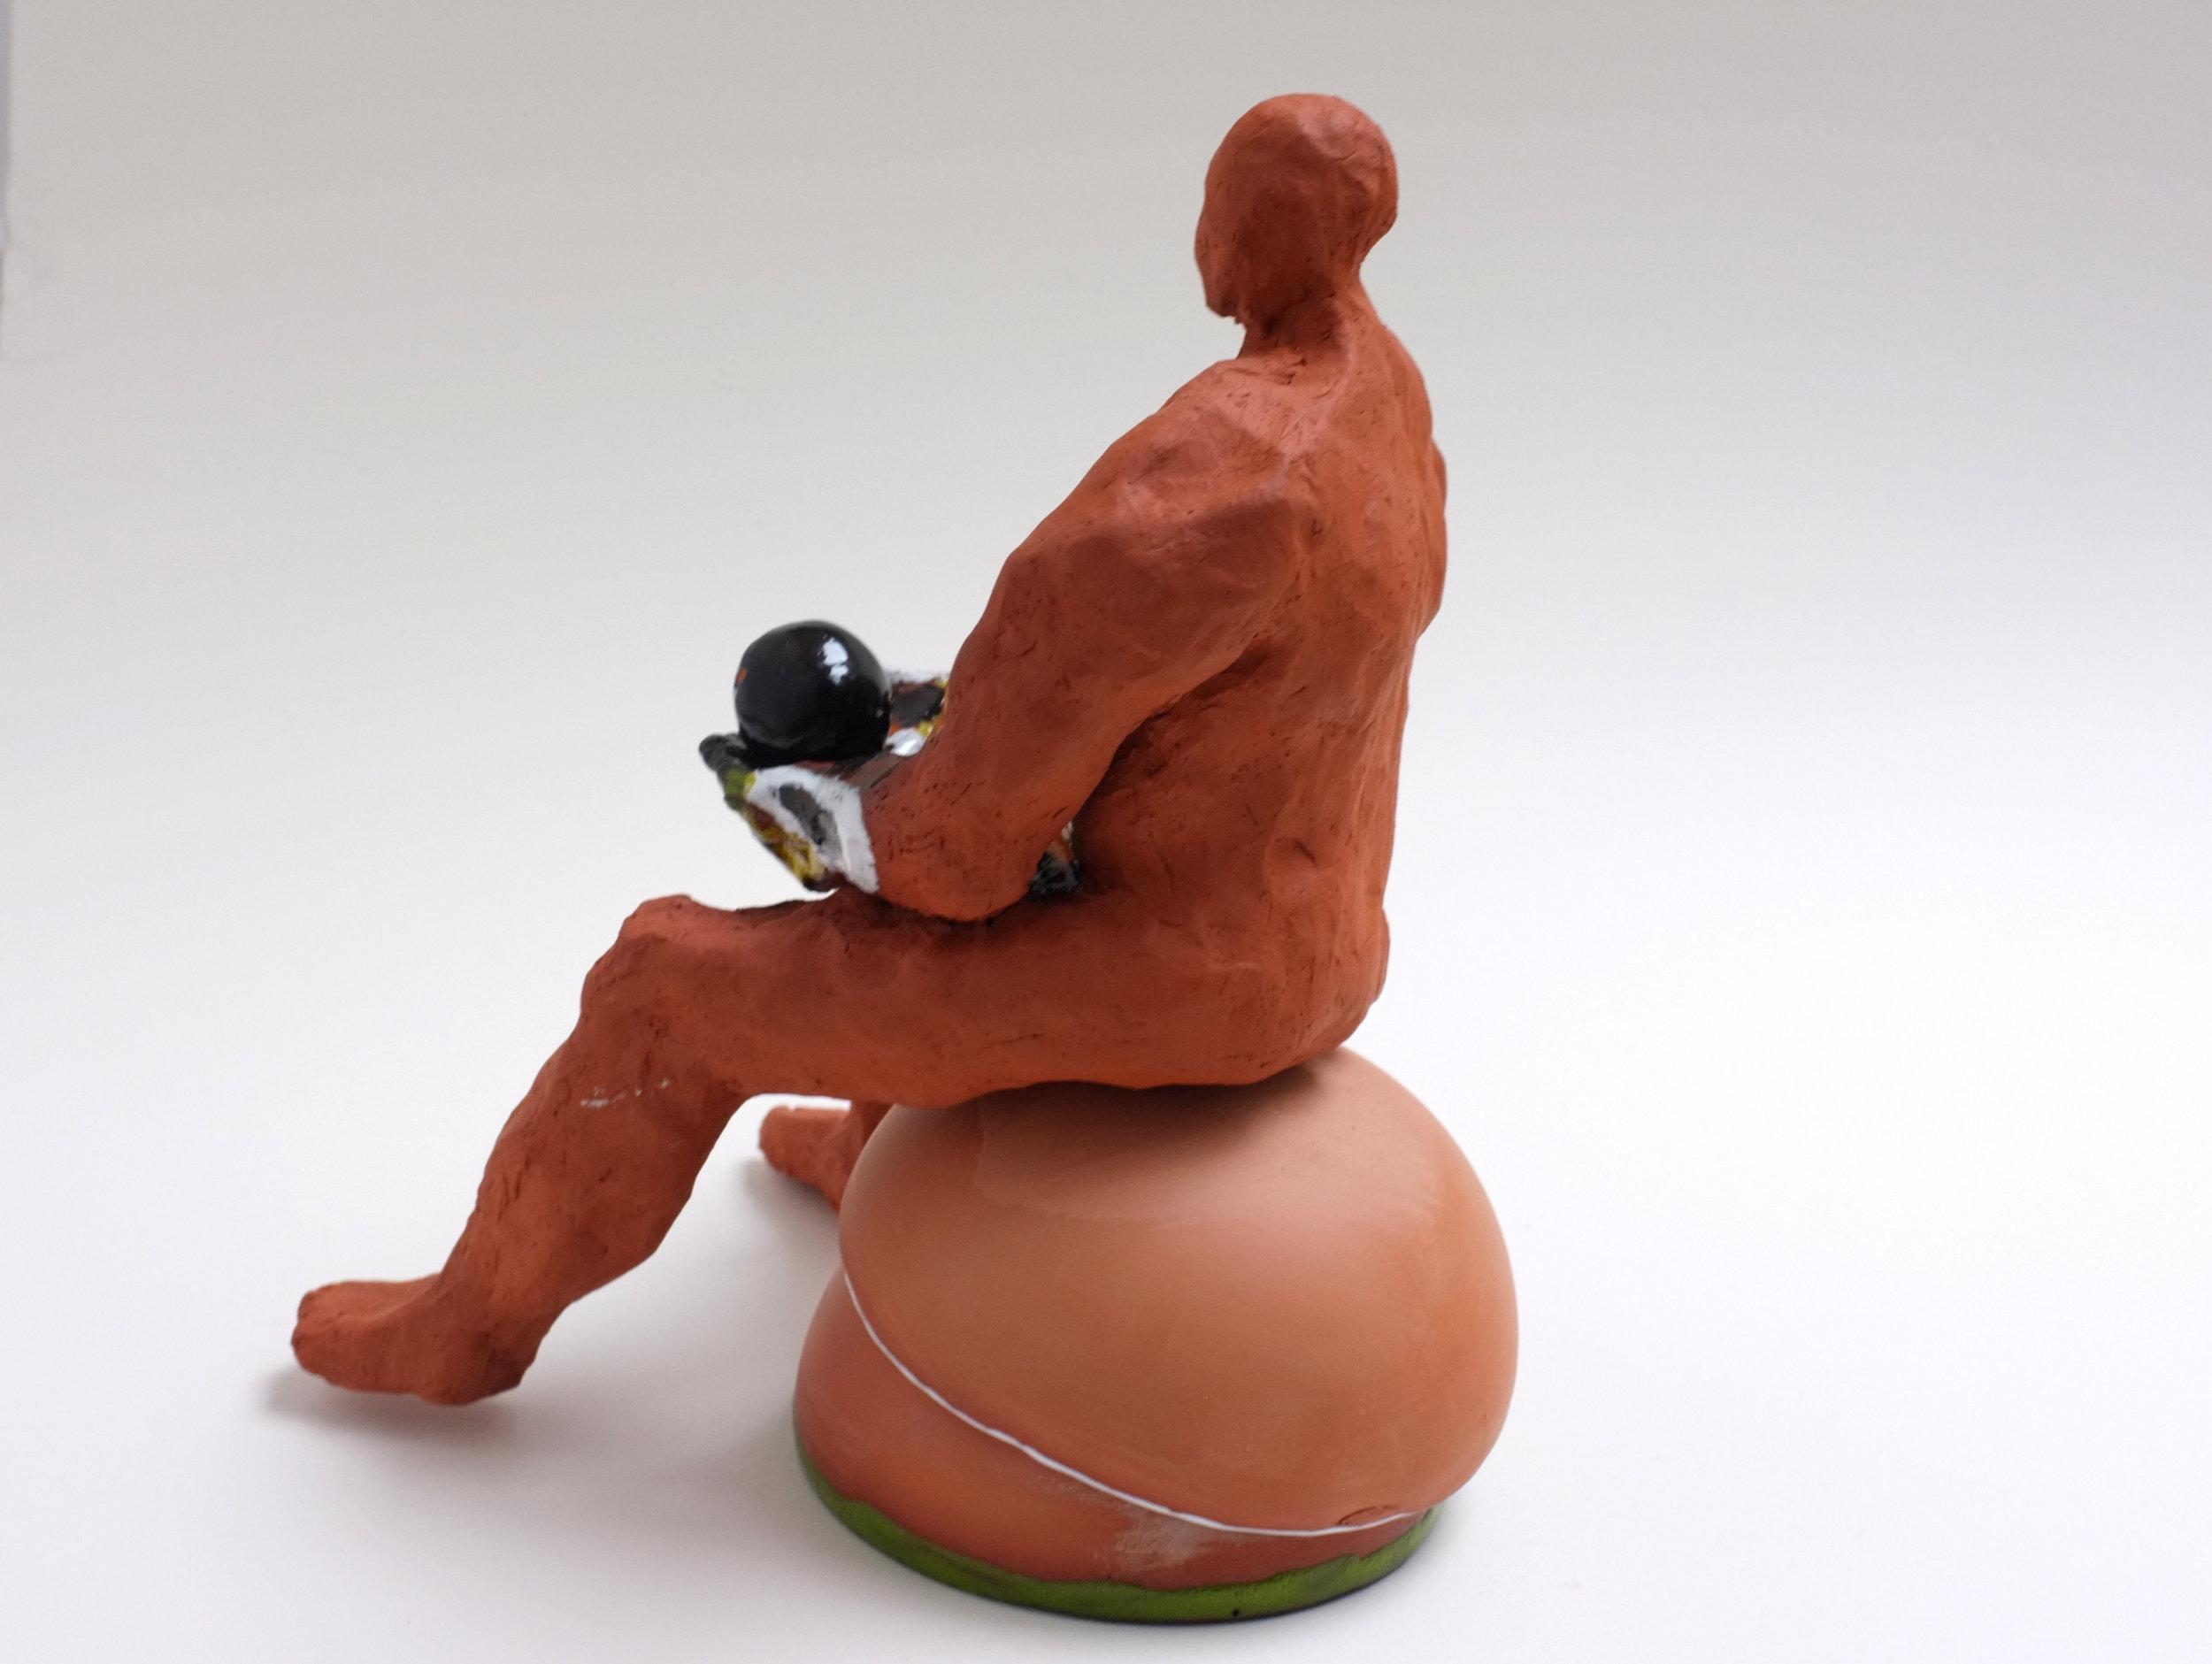 Black_Gold_Ingaga_Ceramics_figure_art_2.jpg